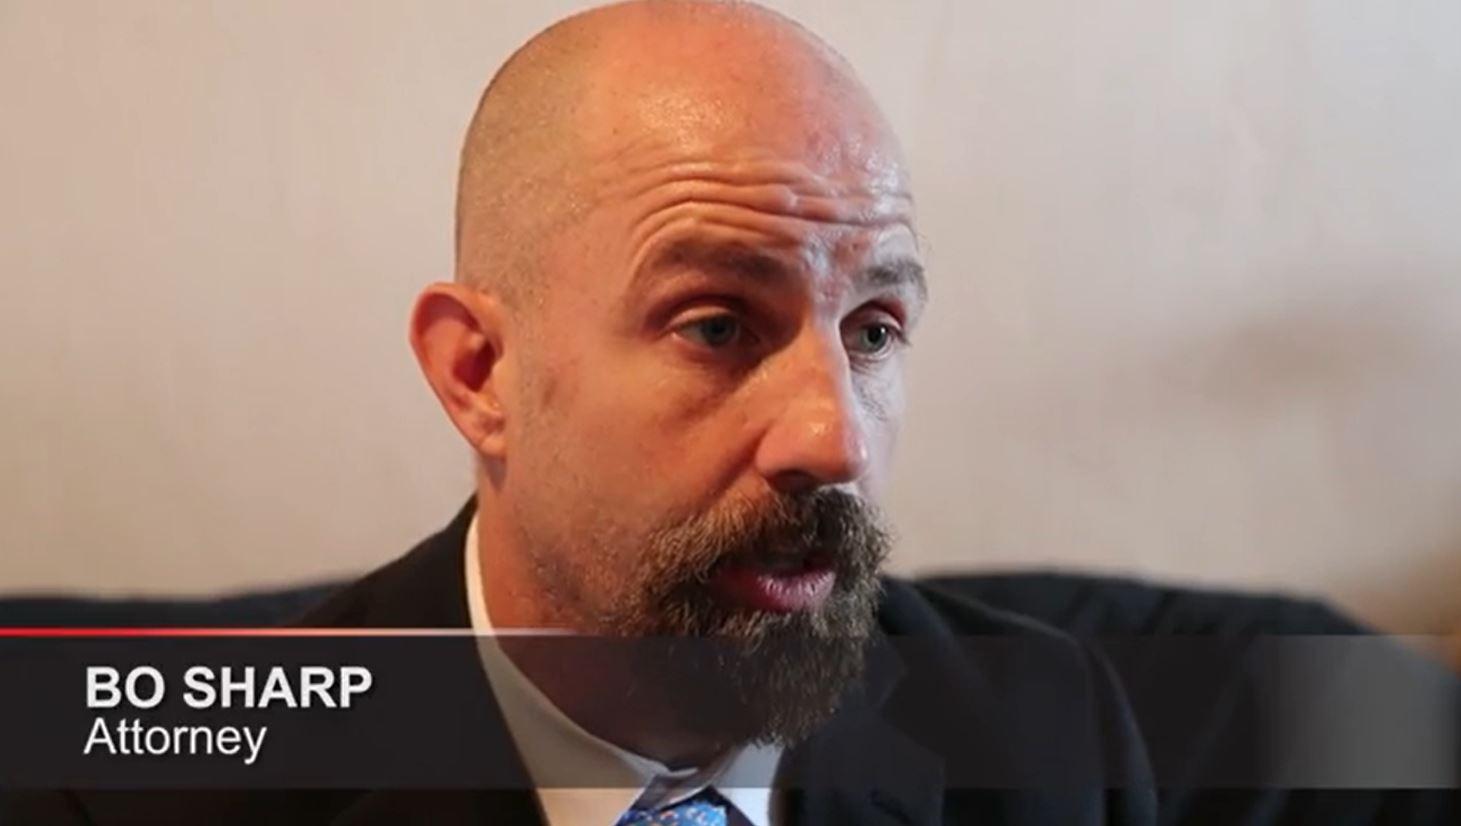 Attorney Richard Bo Sharp discusses malpractice lawsuits